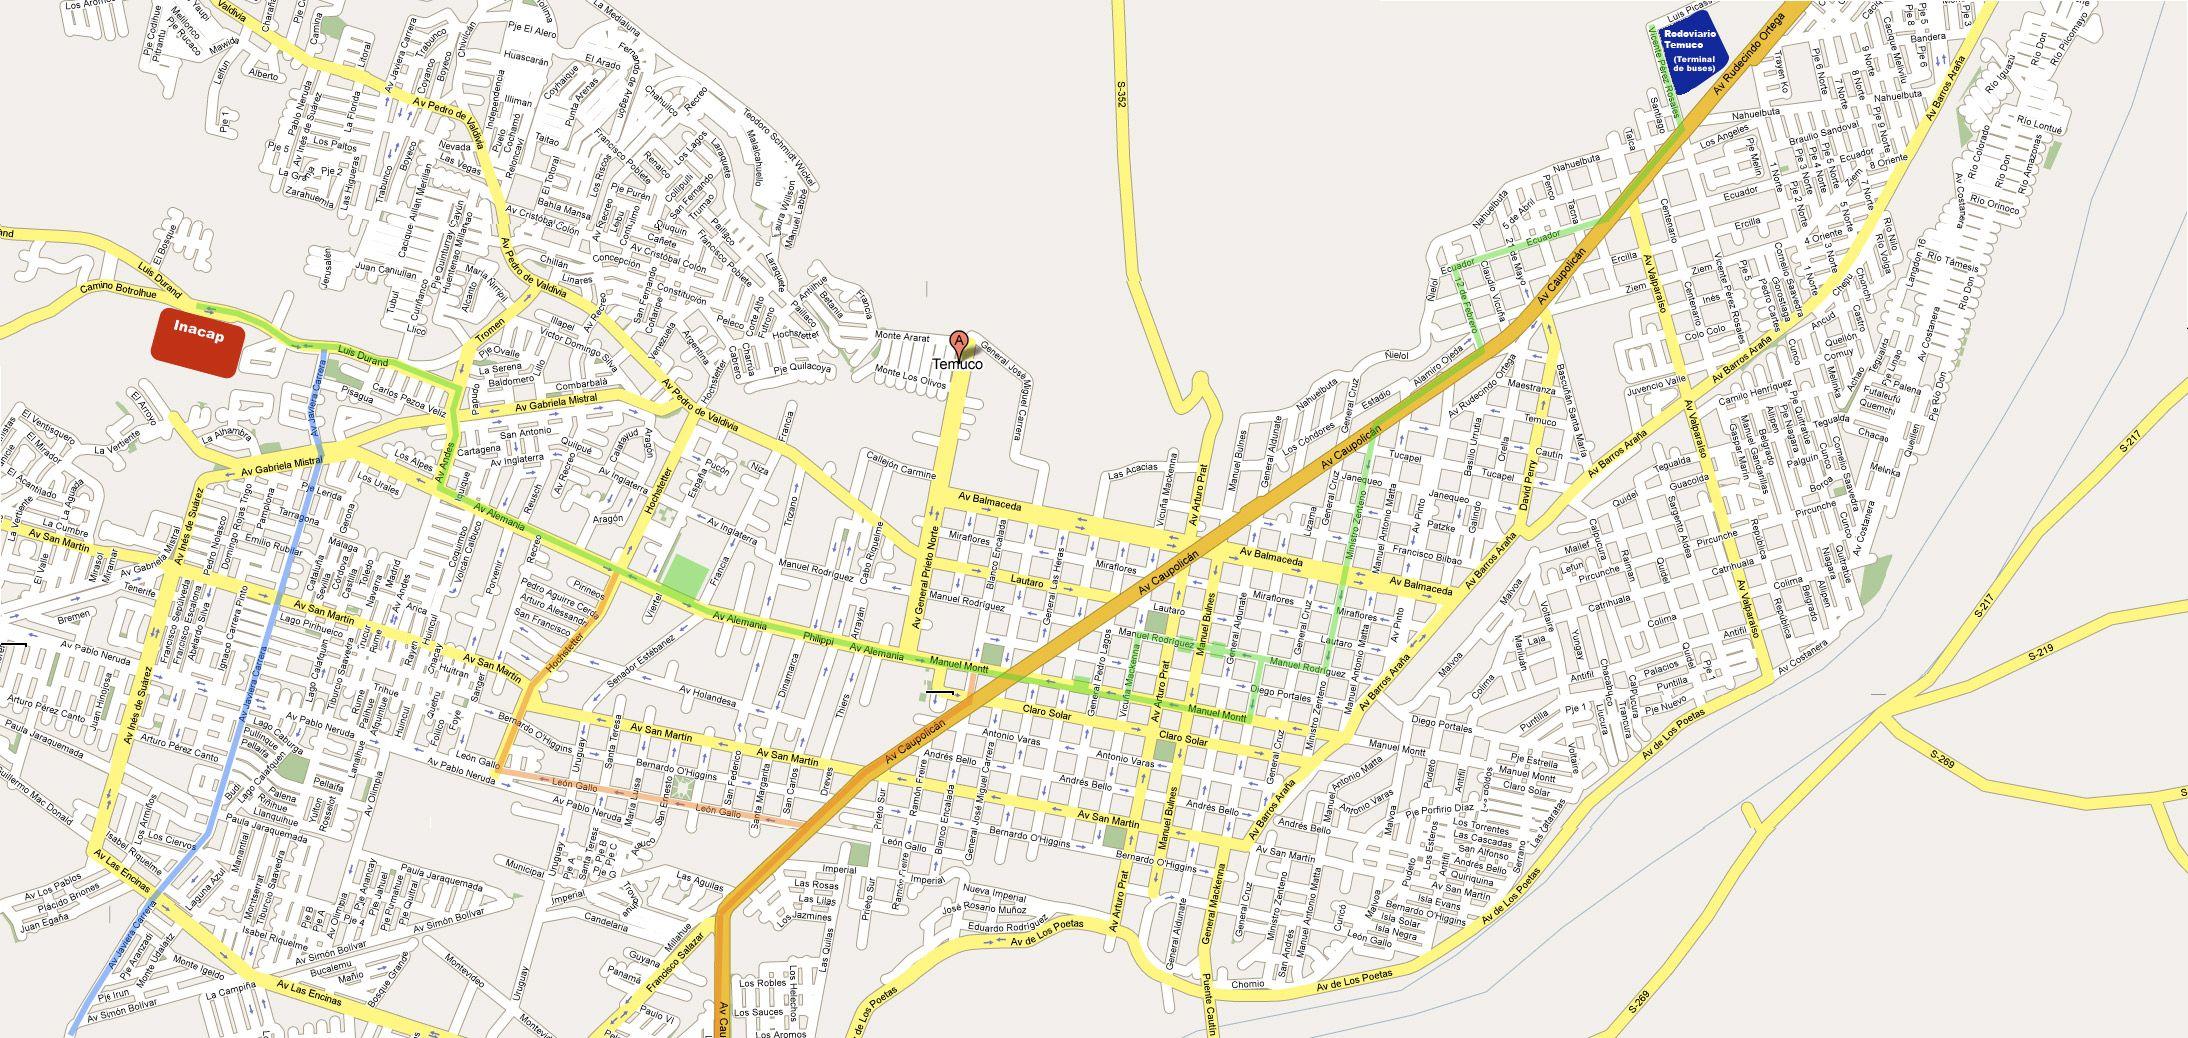 Mapa Temuco Http Gexpo Rayout Cl Images Rutero Temuco Grande Jpg